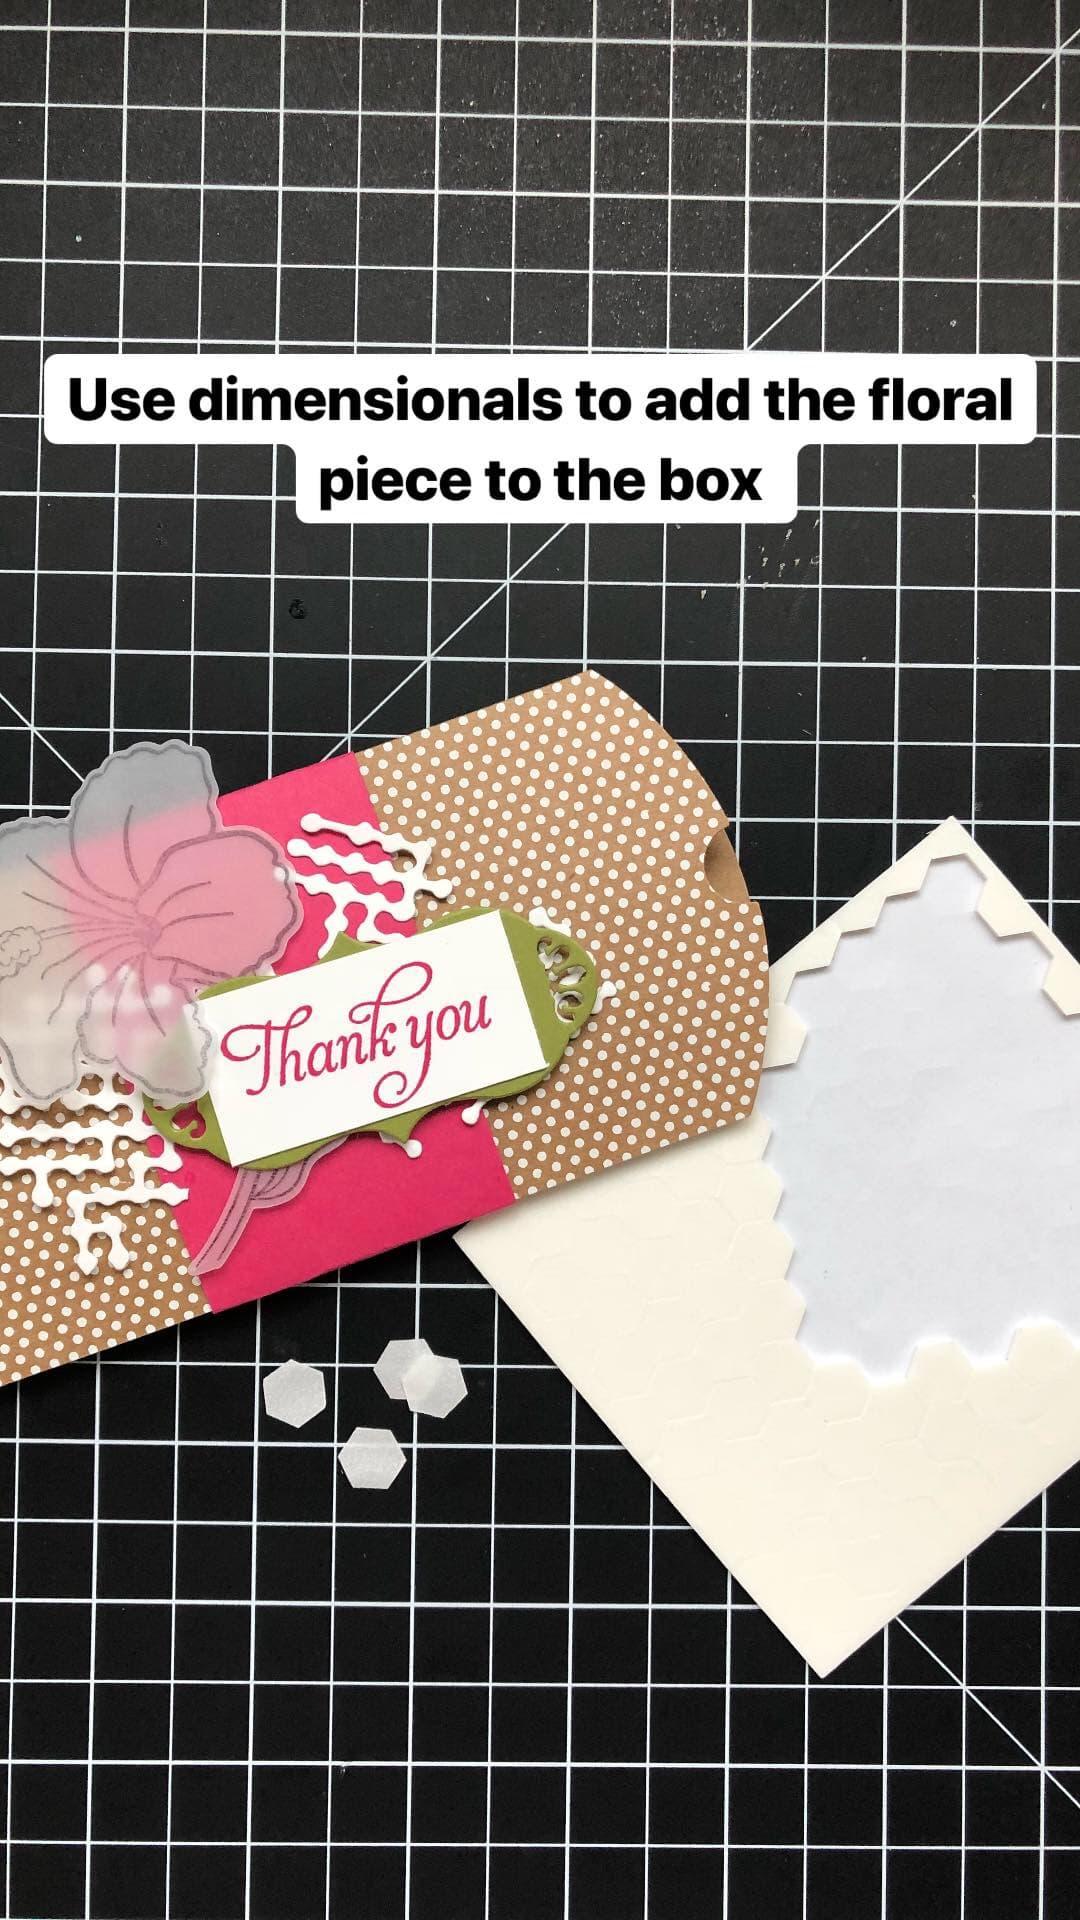 Humming Along bundle from Stampin' UP! Wendy Cranford luvinstampin.com #luvinstampin #stampinup #hummingalong #thankyougift #partyfavor #cardmaking #papercraft